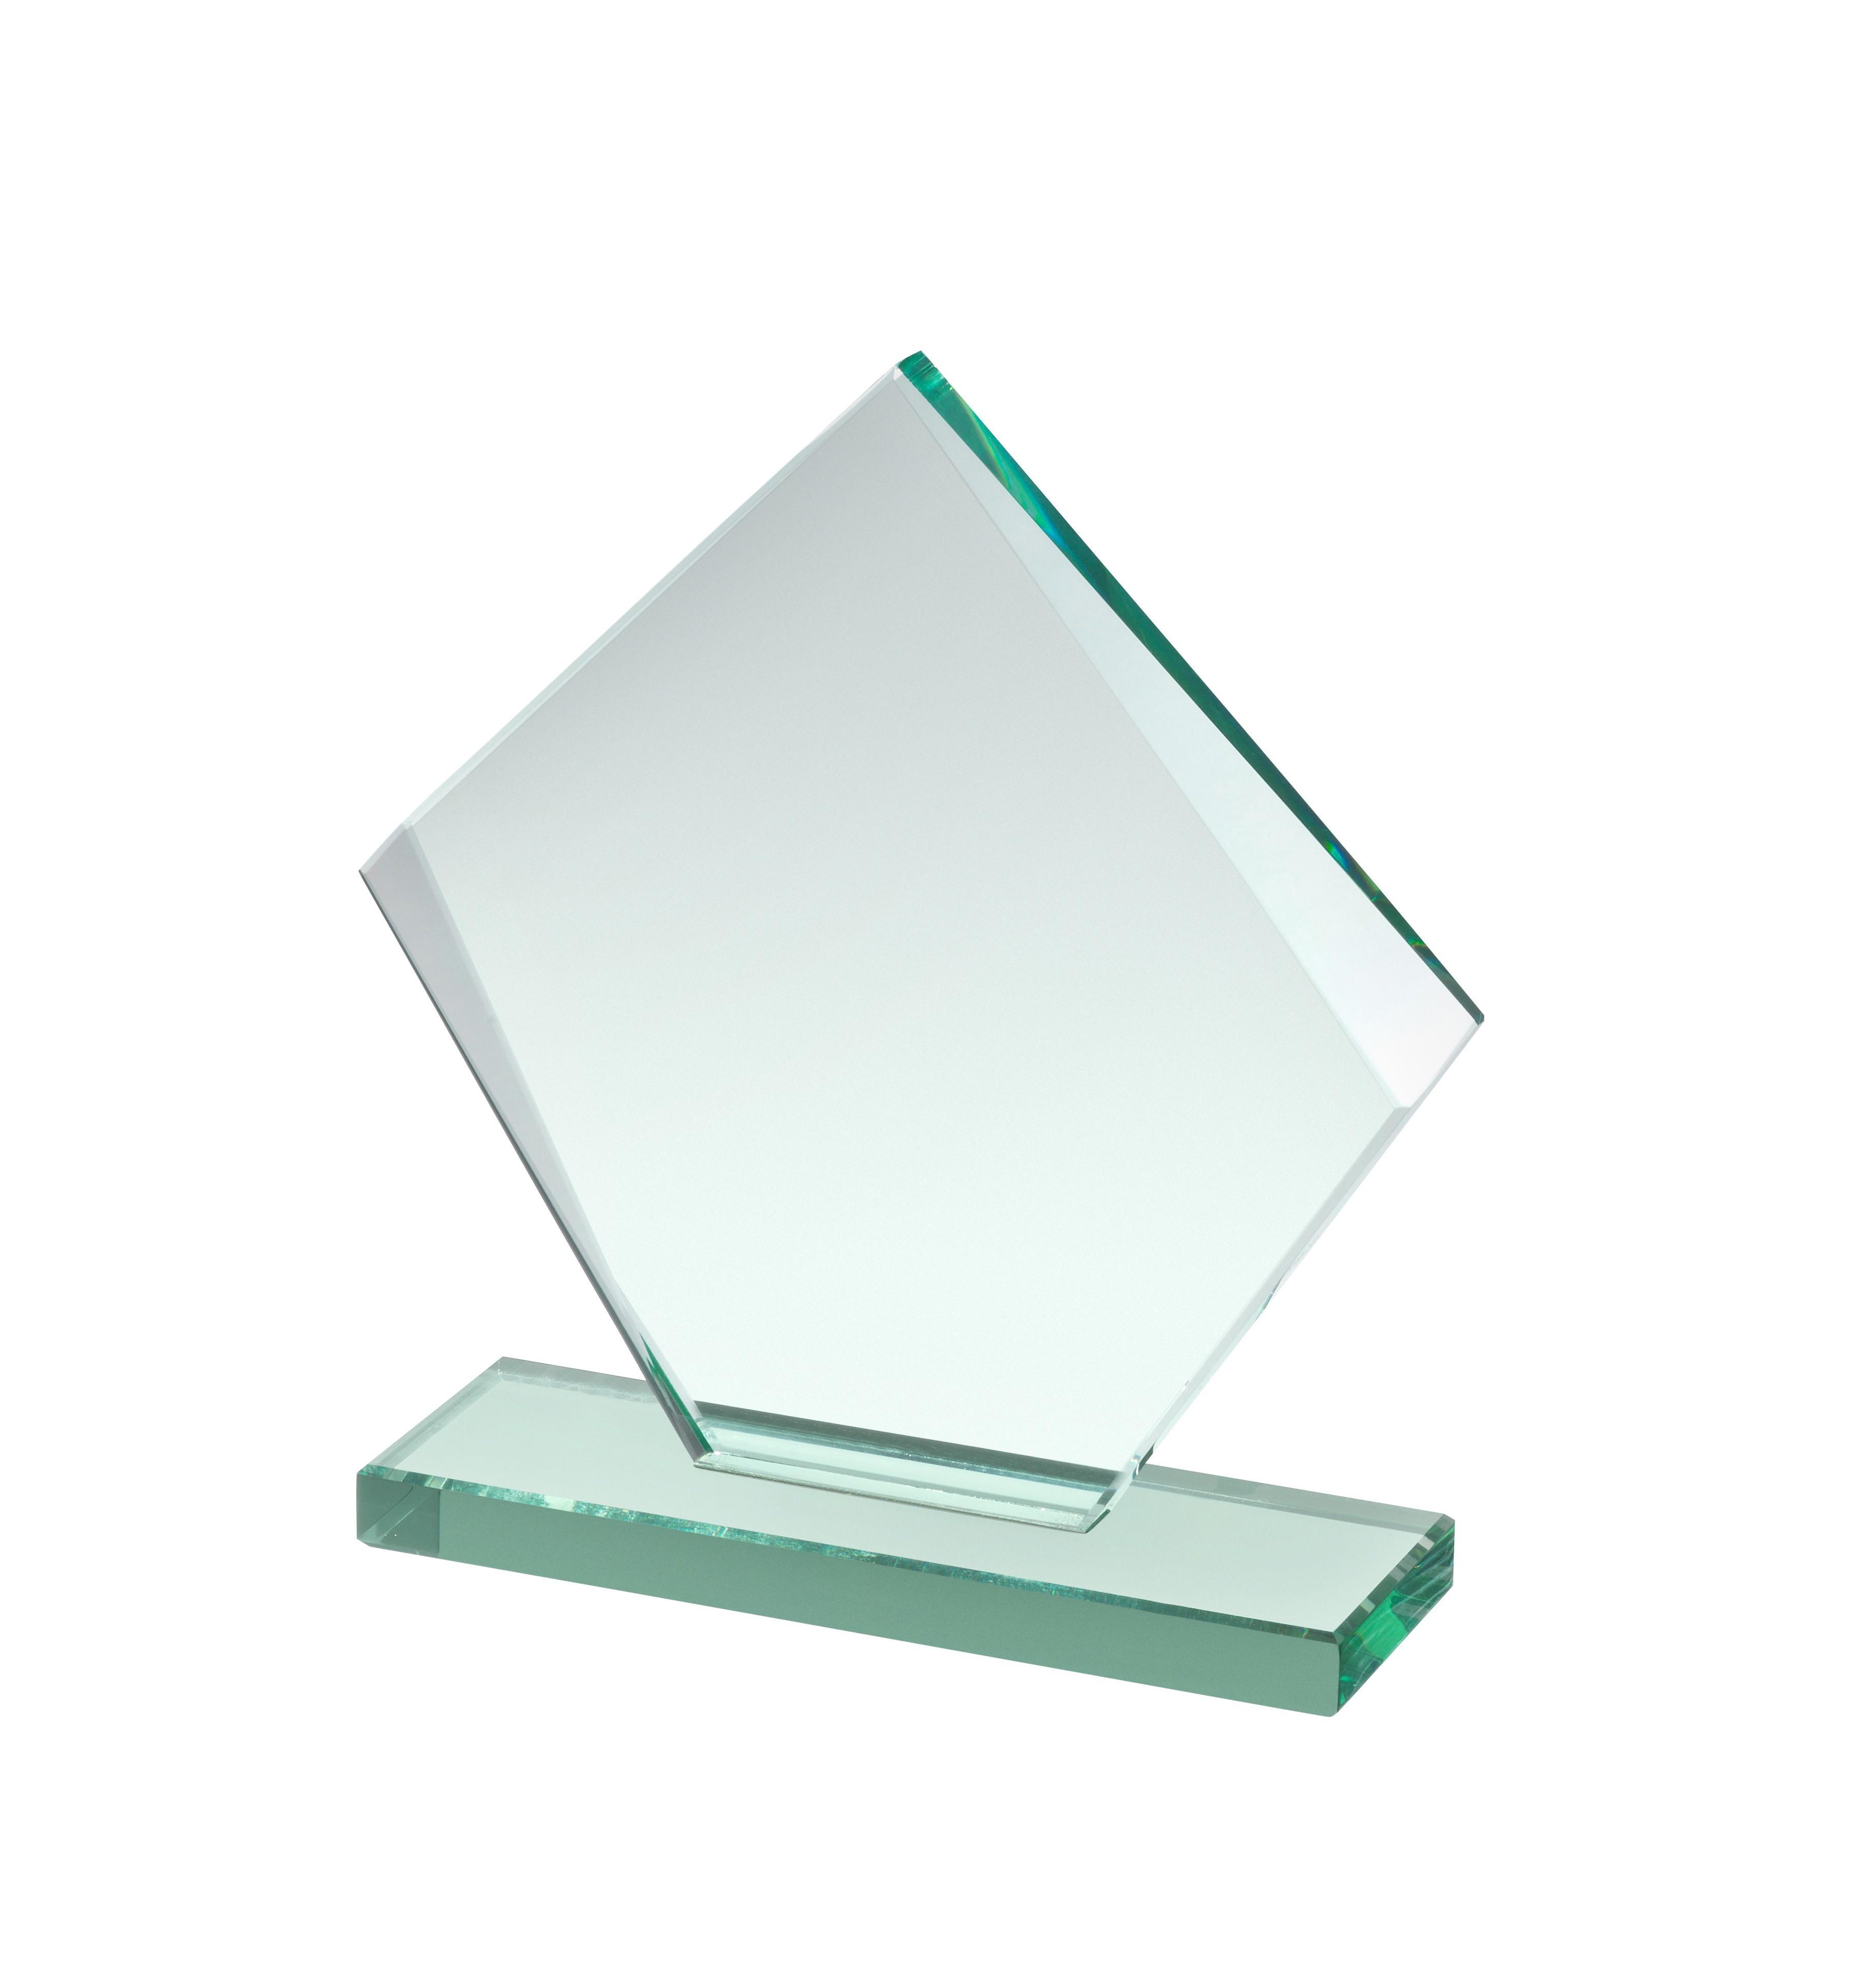 10mm Thick Jade Glass Rhombus Award